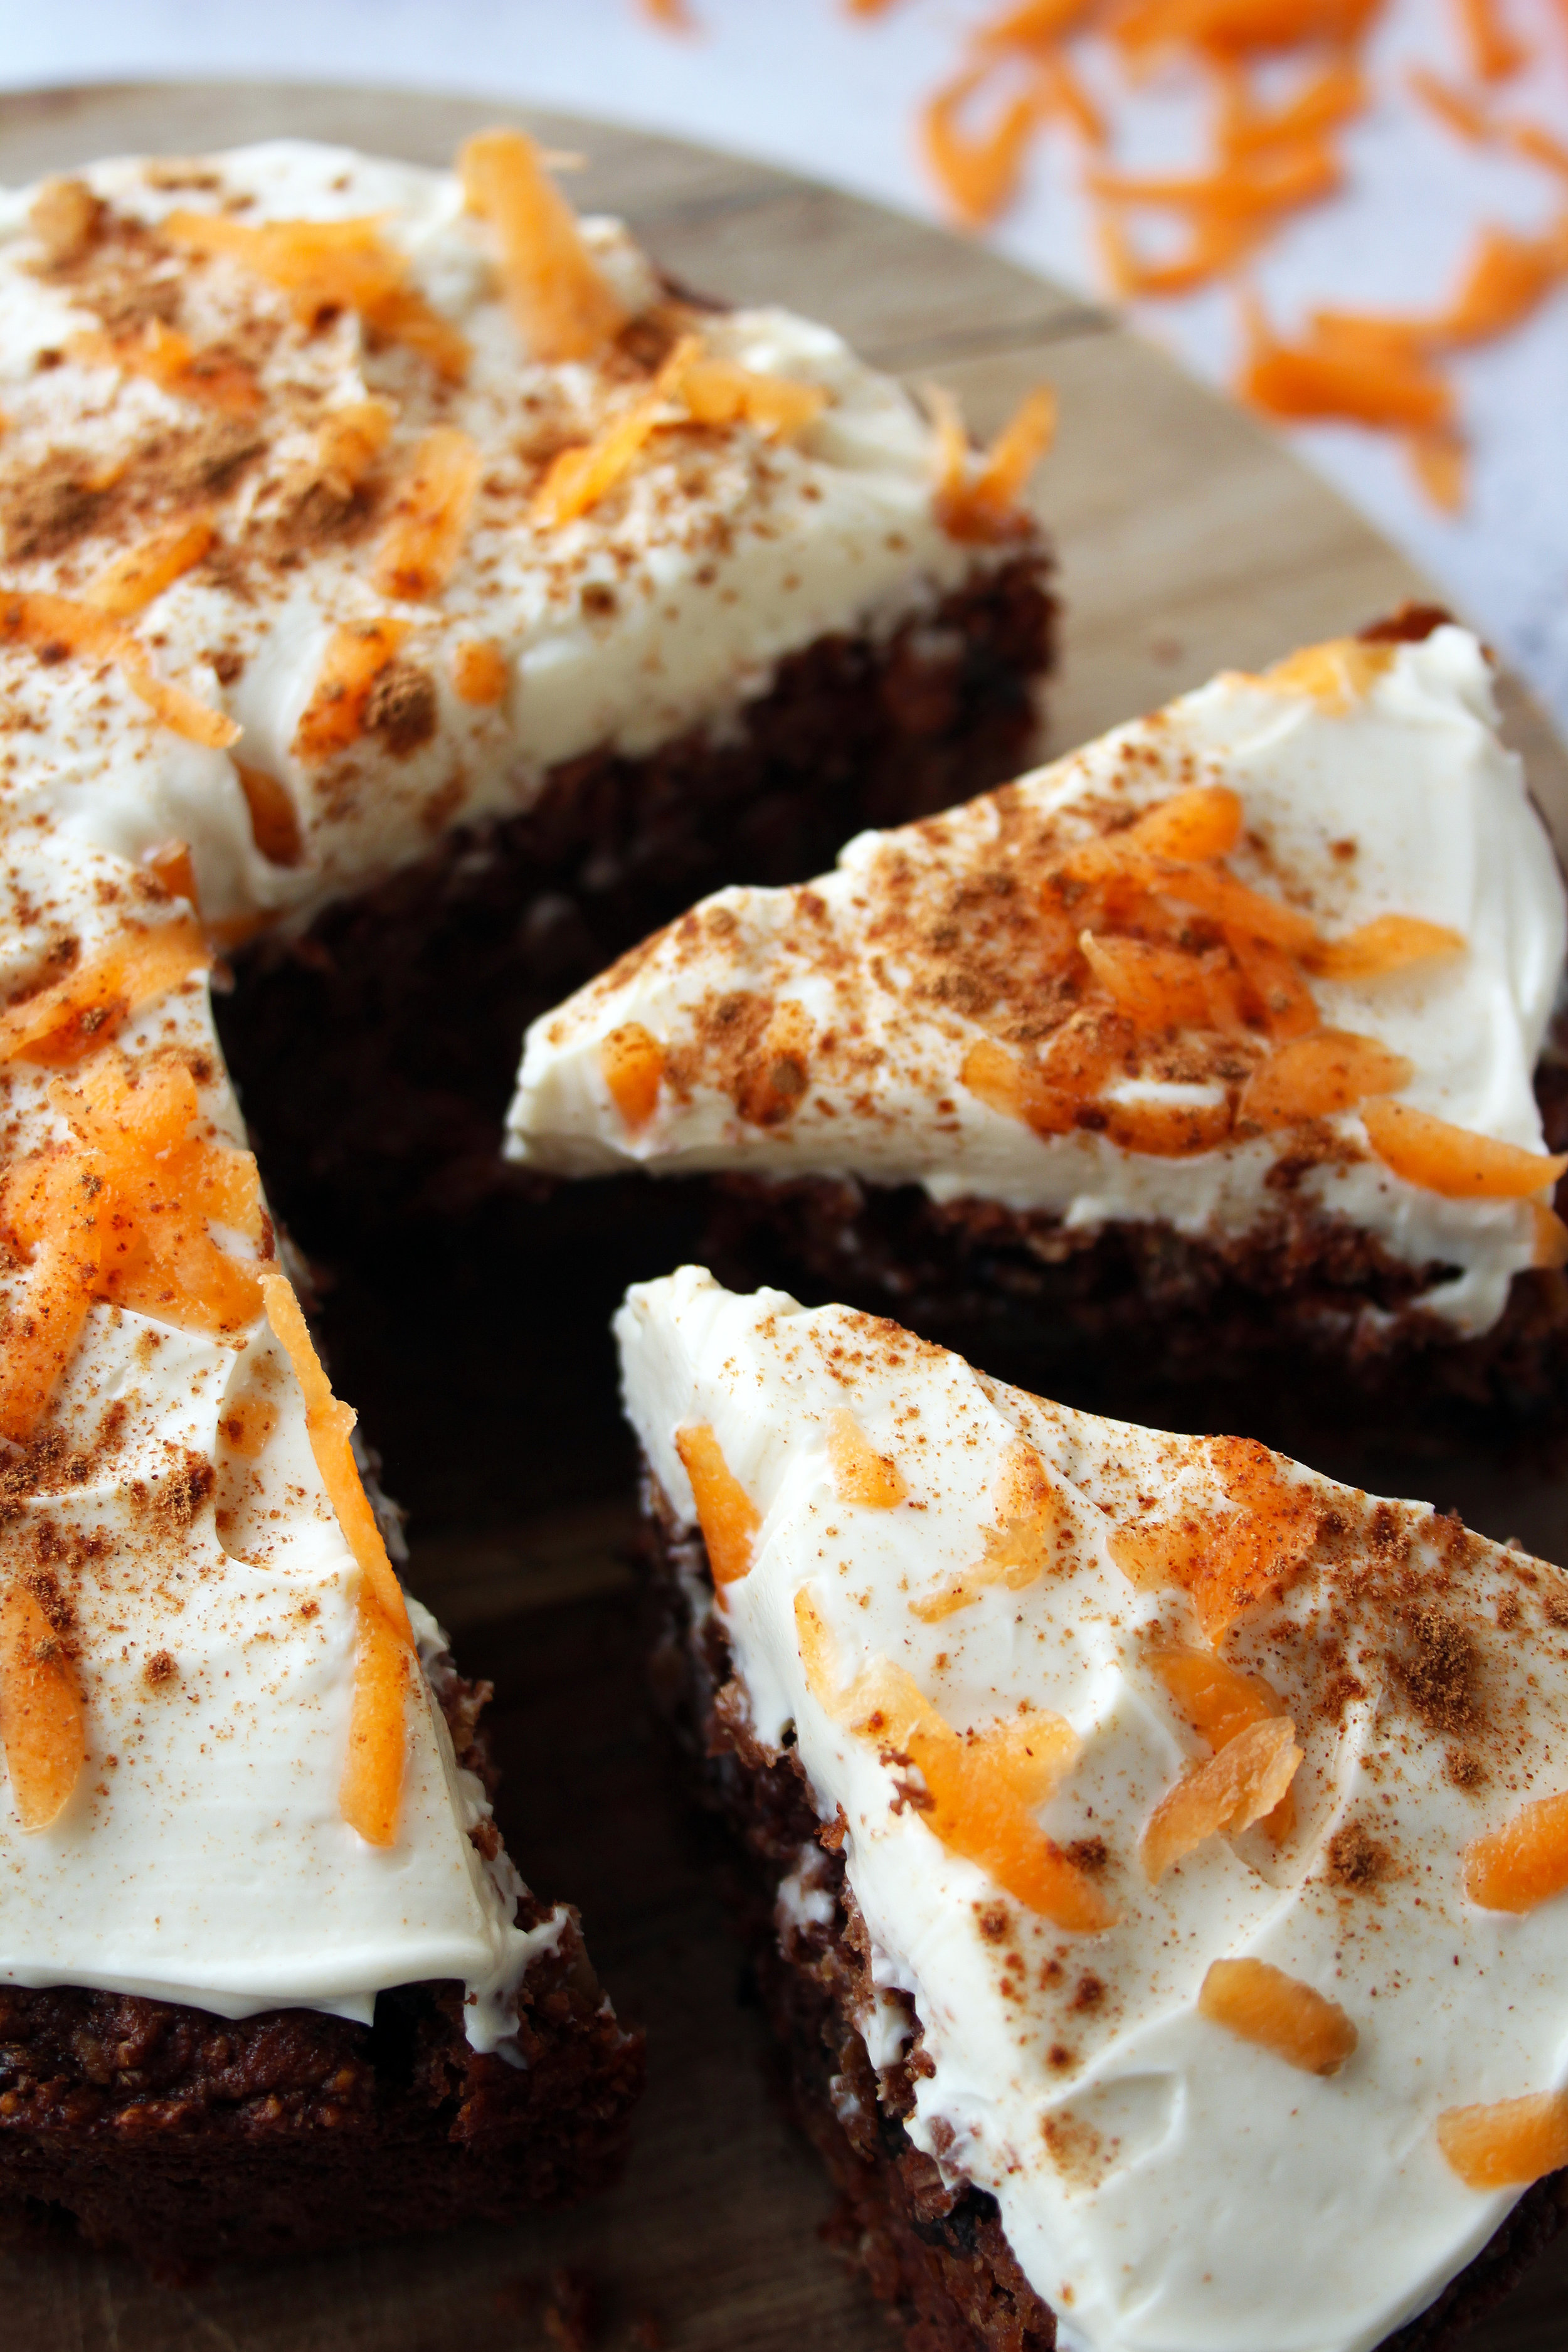 Cinnamon spiced carrot cake recipe | The Flourishing Pantry